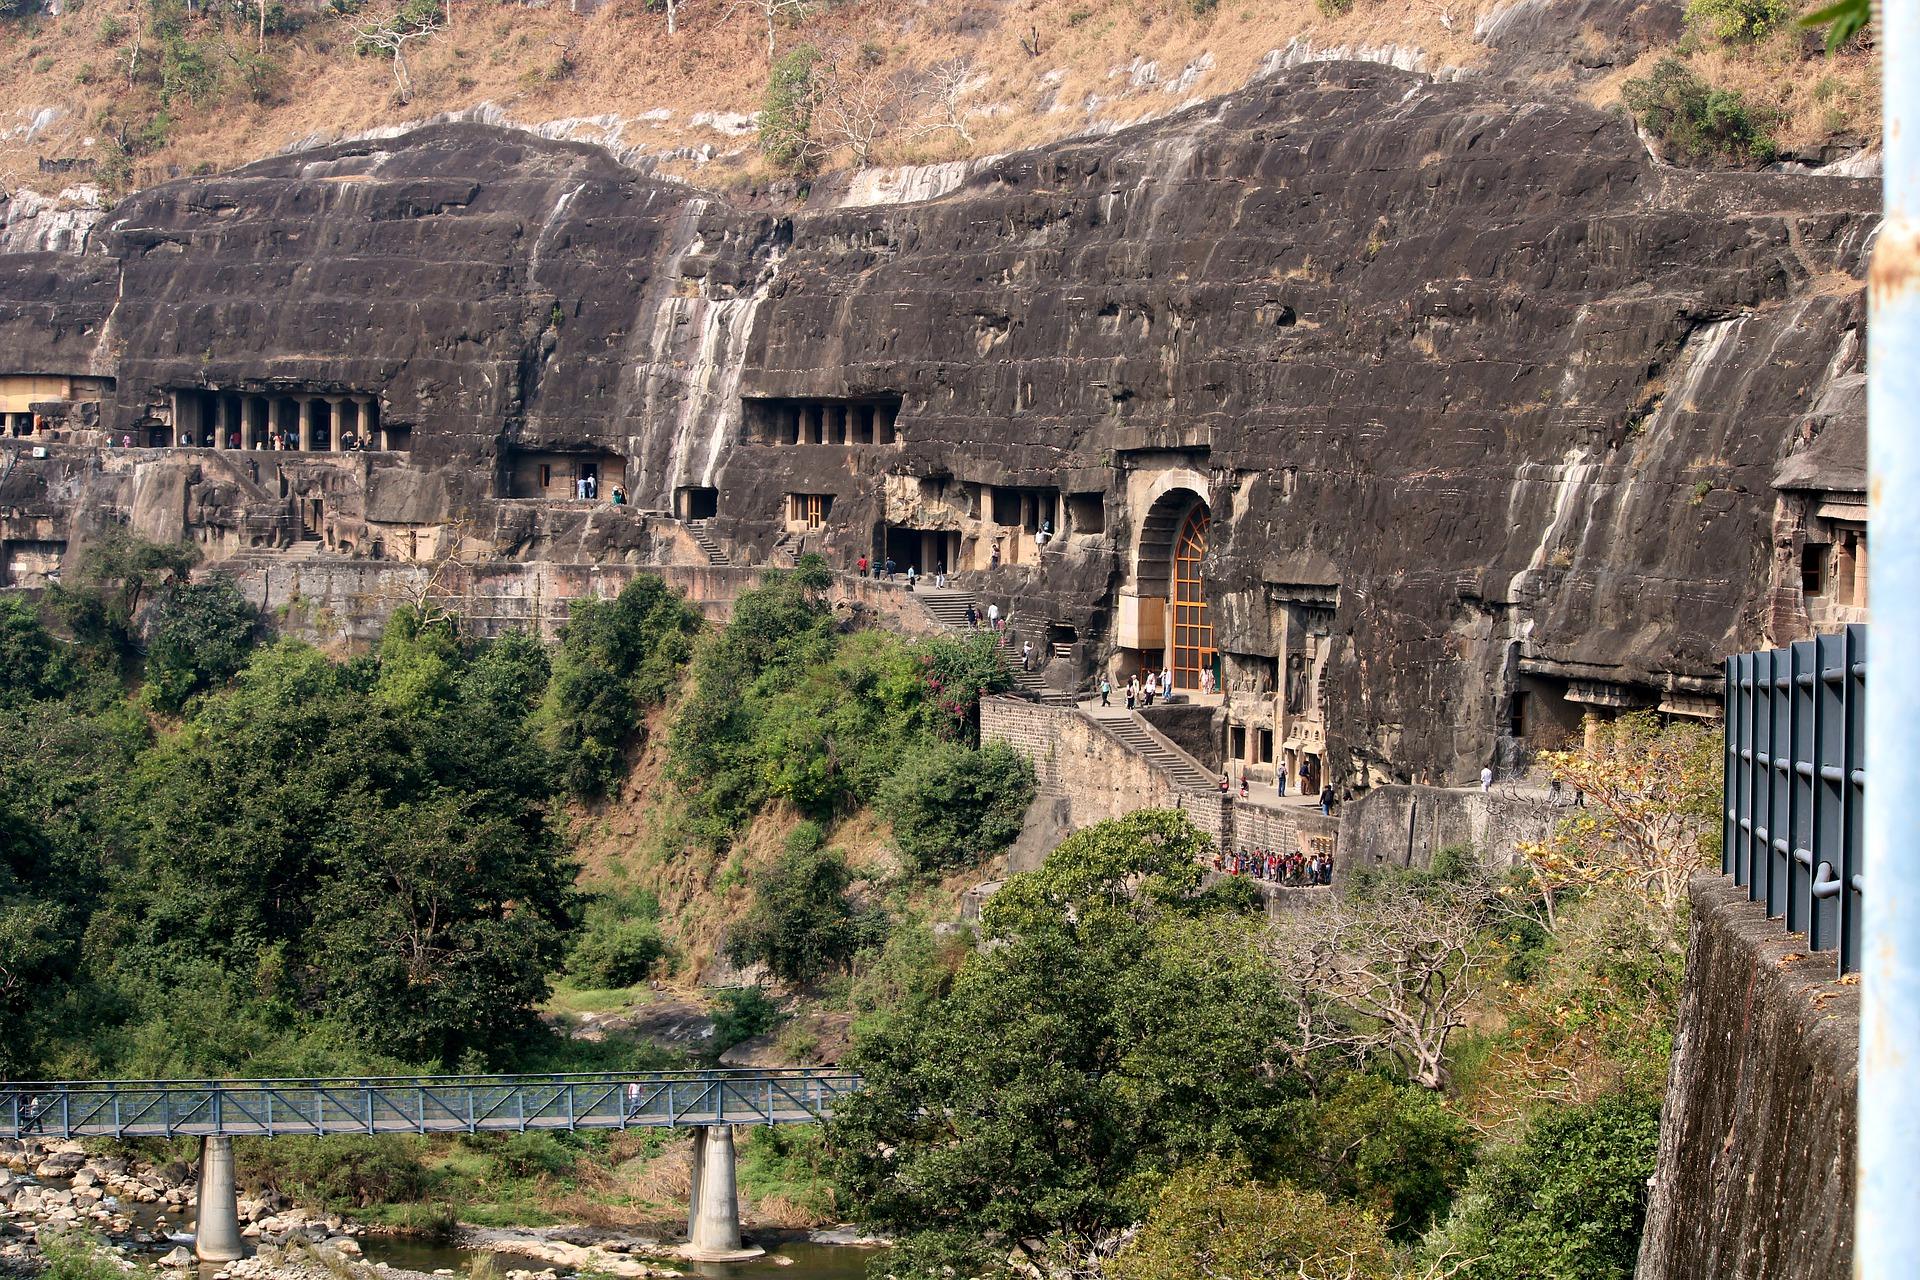 The Ajanta Caves Experience